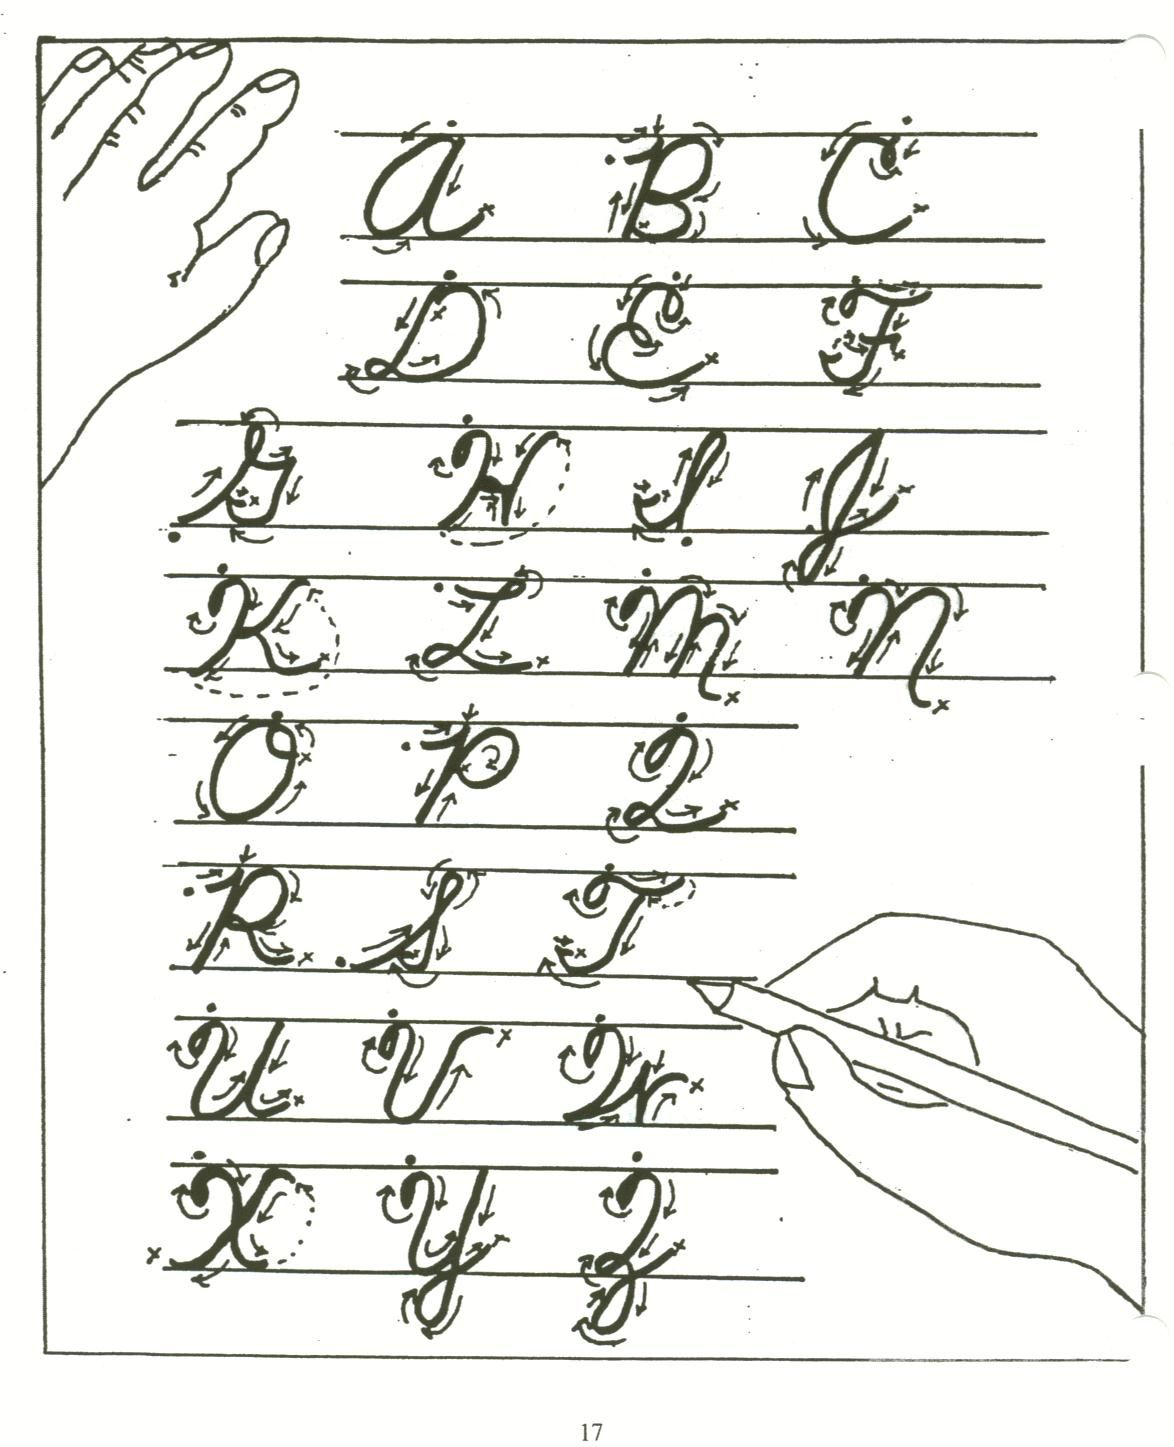 Cursive Calligraphy Alphabet Learning Cursive Cursive Handwriting Worksheets Cursive Writing [ 1447 x 1174 Pixel ]